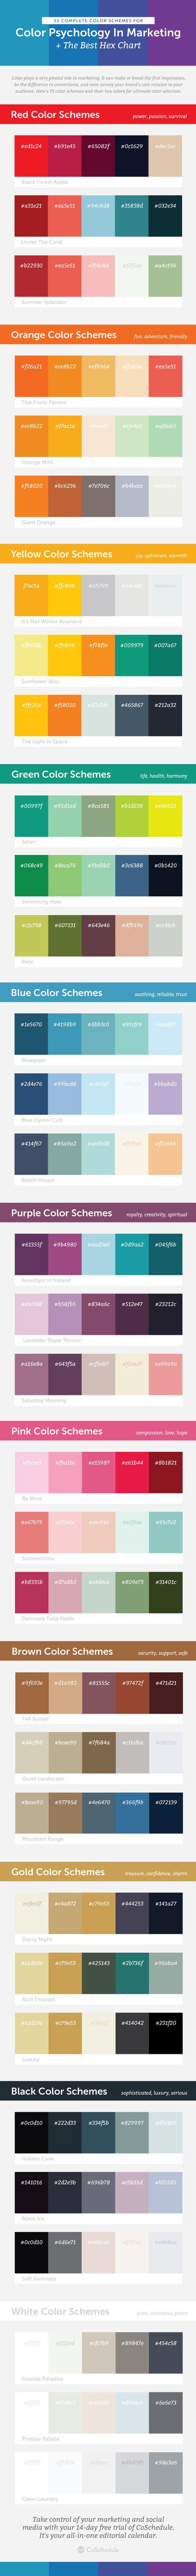 Download 28 Mock Ups Ideas Mocking Color Psychology Color Mixing Chart